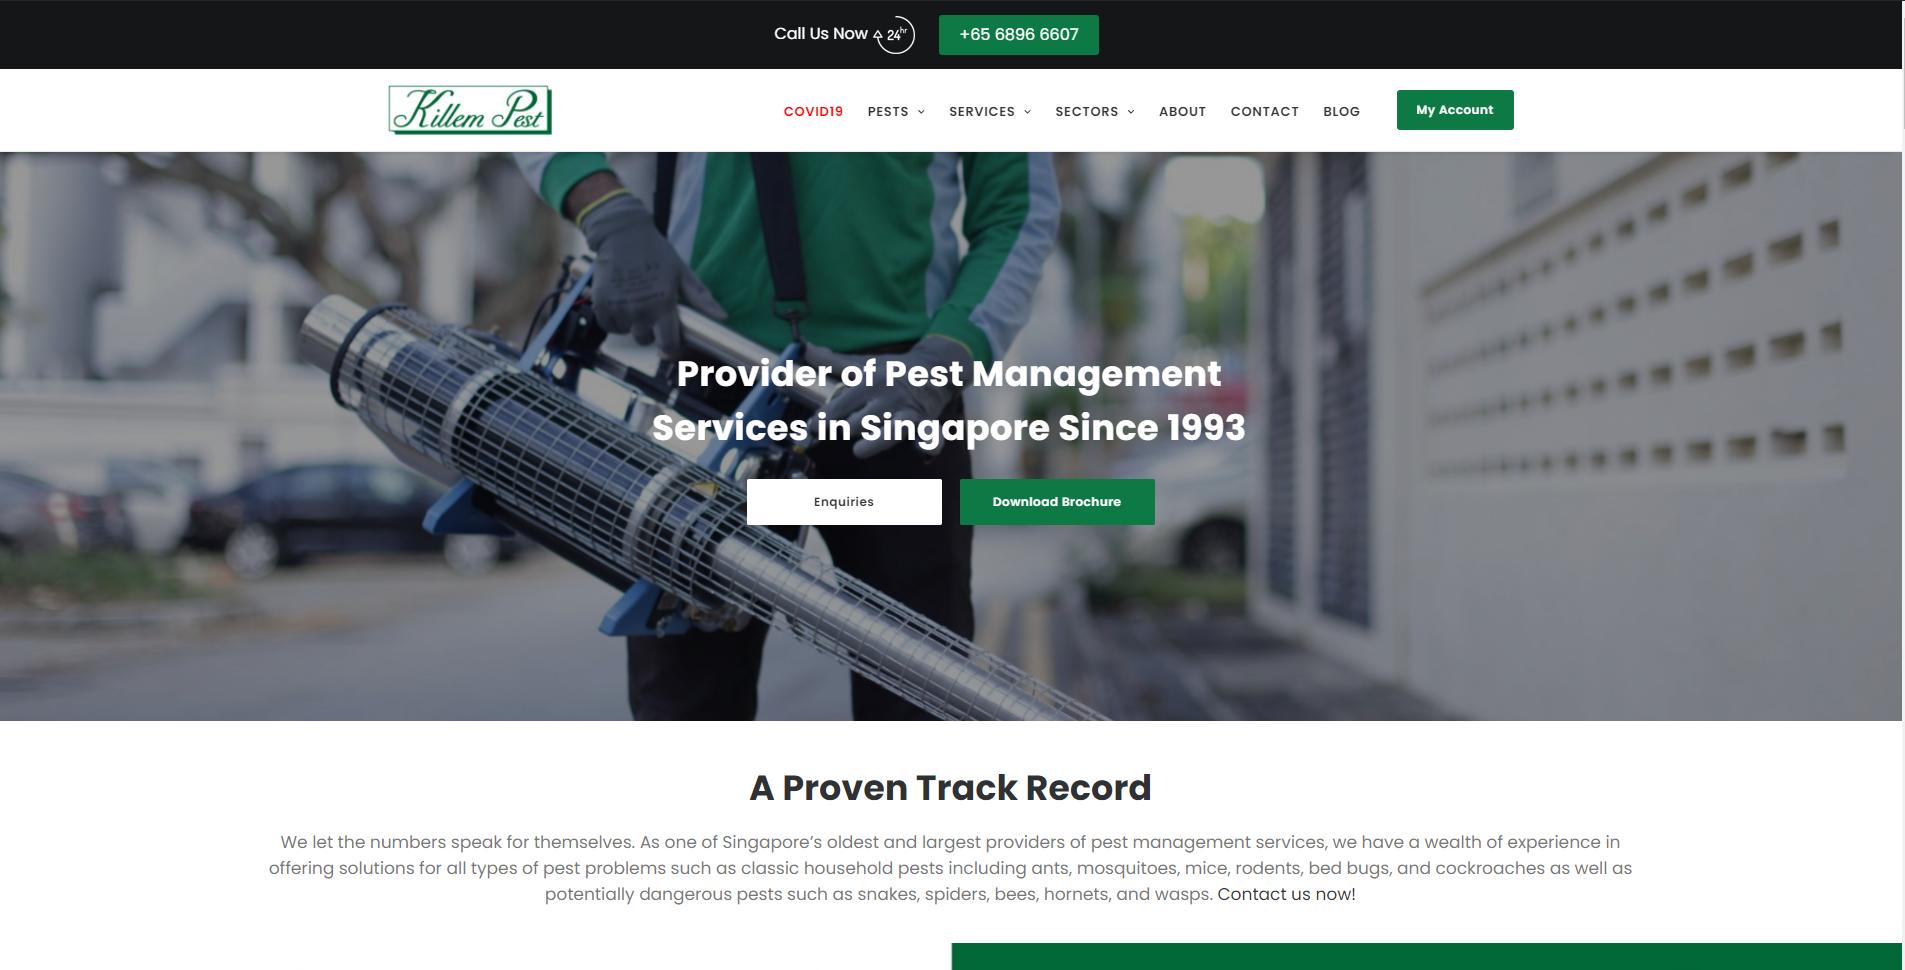 Killem Pest pest control companies in Singapore